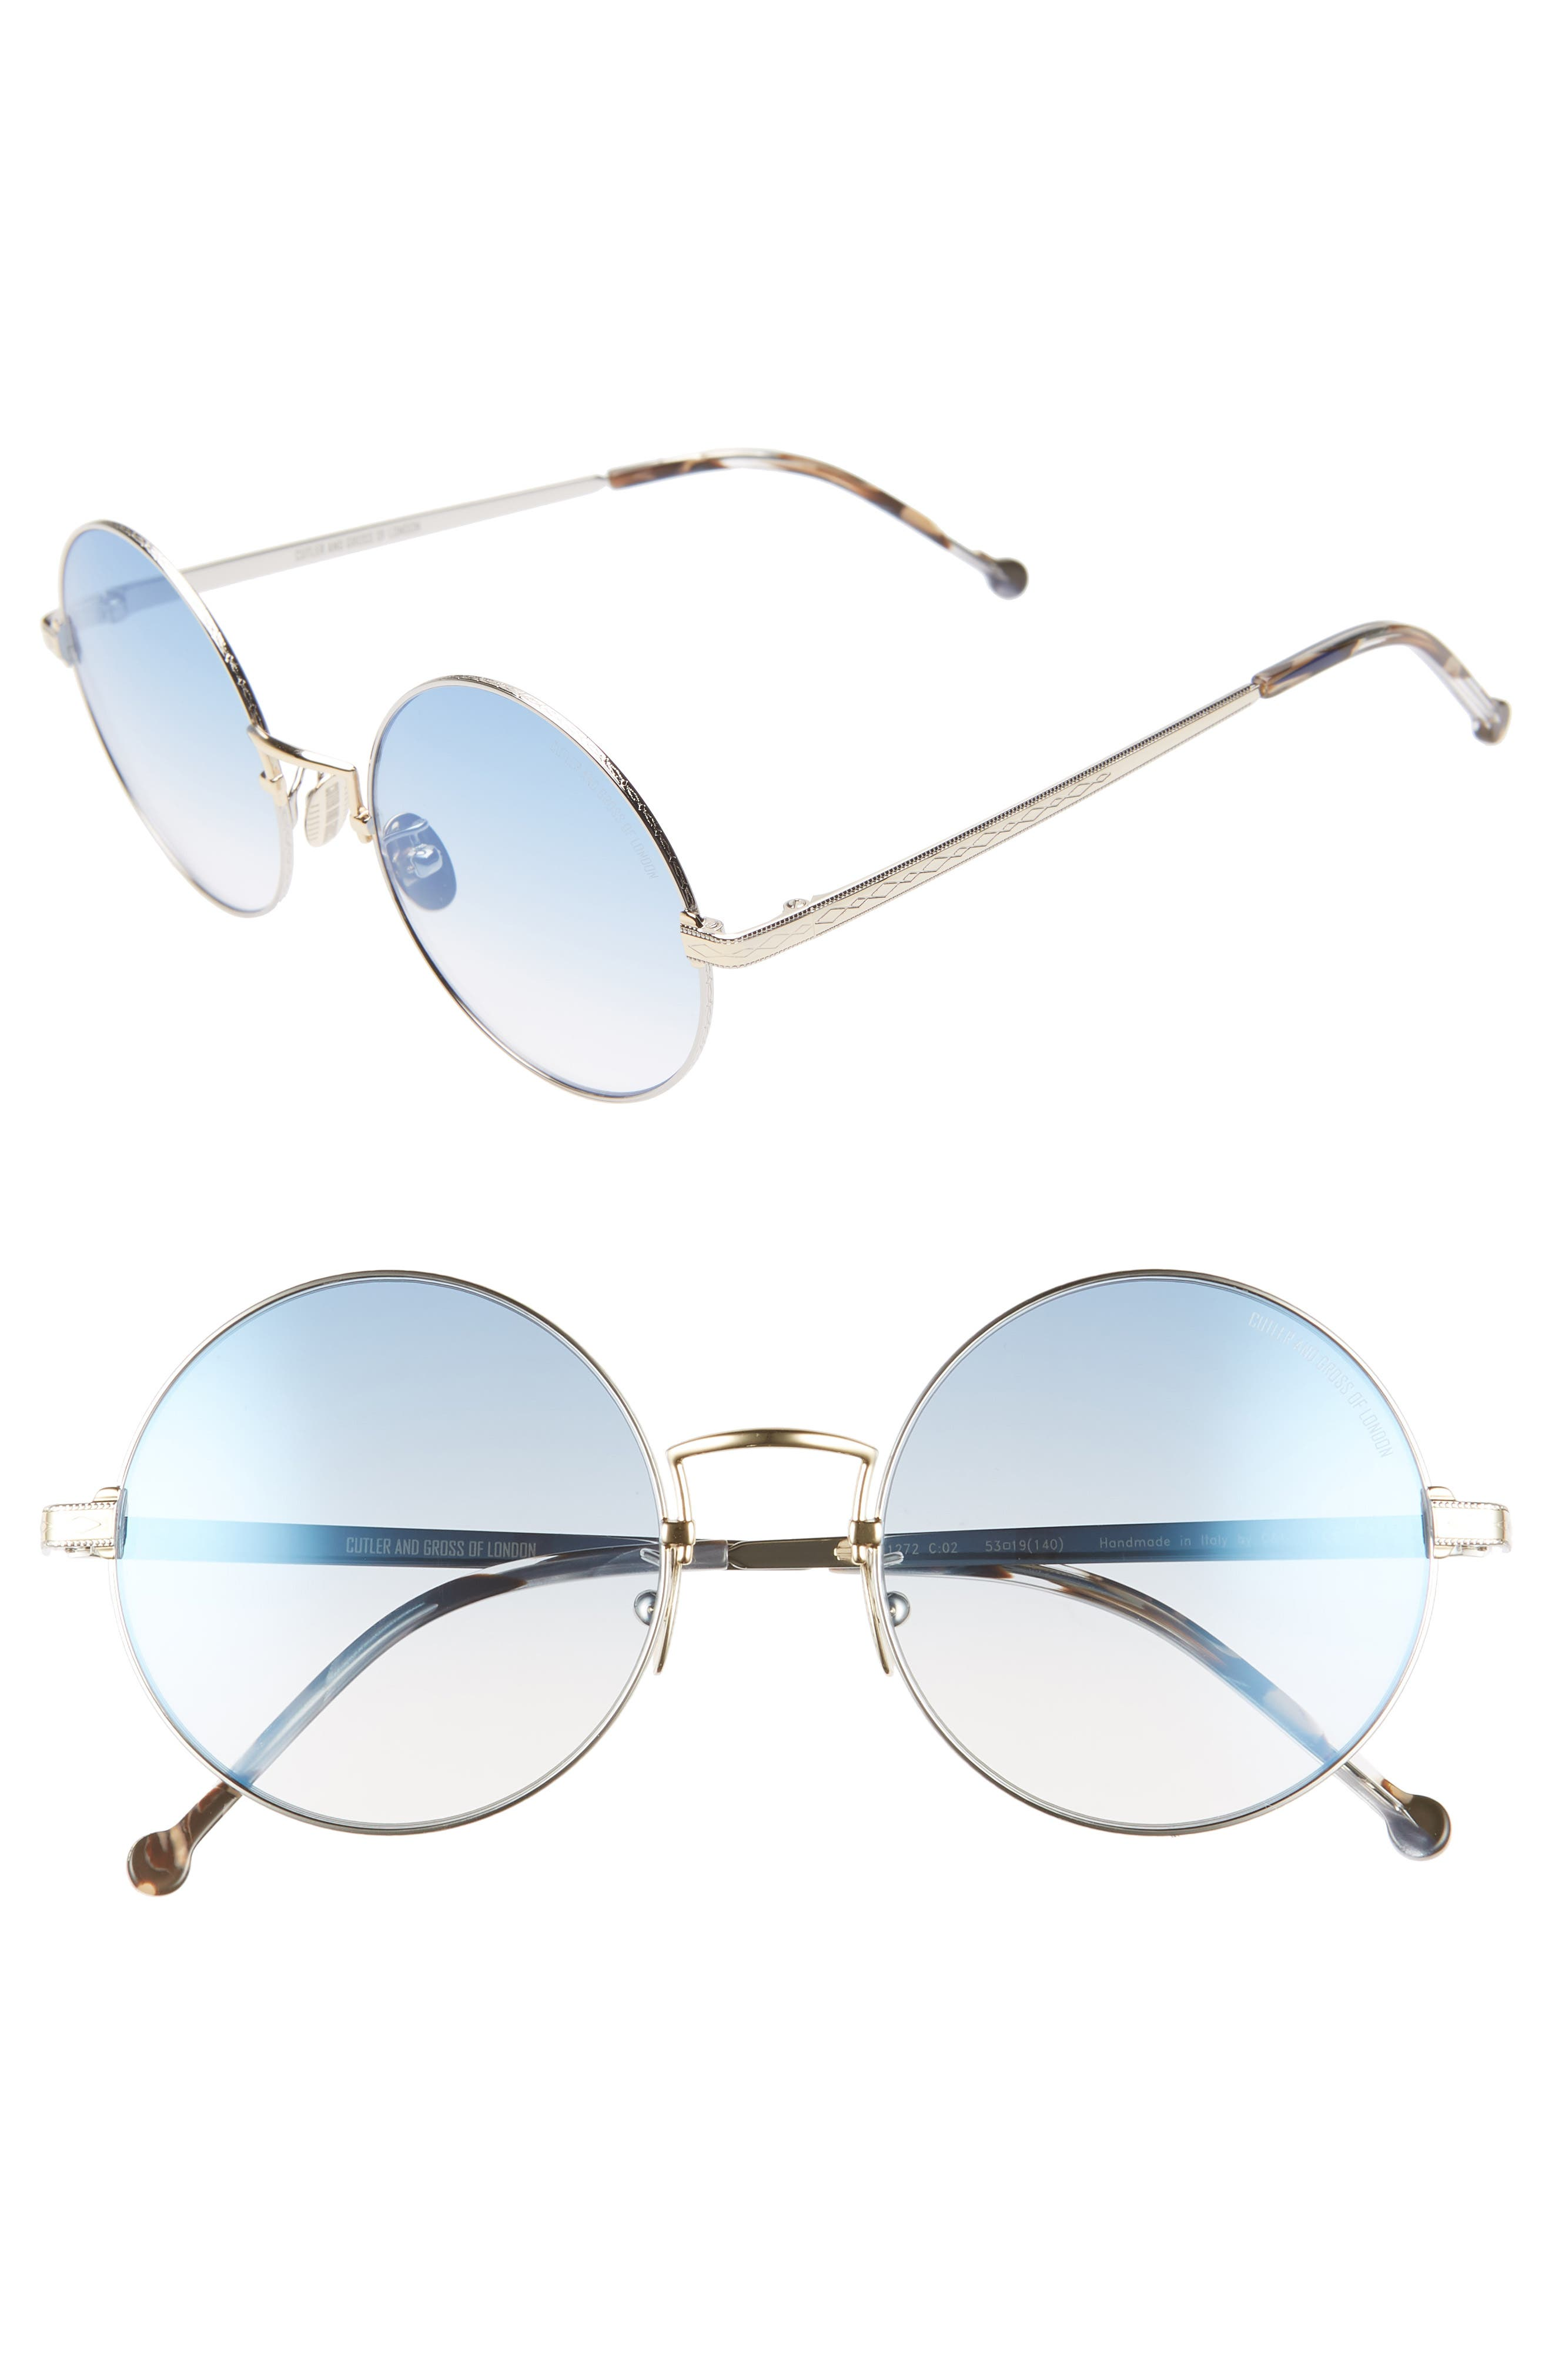 4f8c9b3dbd9 Cutler And Gross Sunglasses for Women